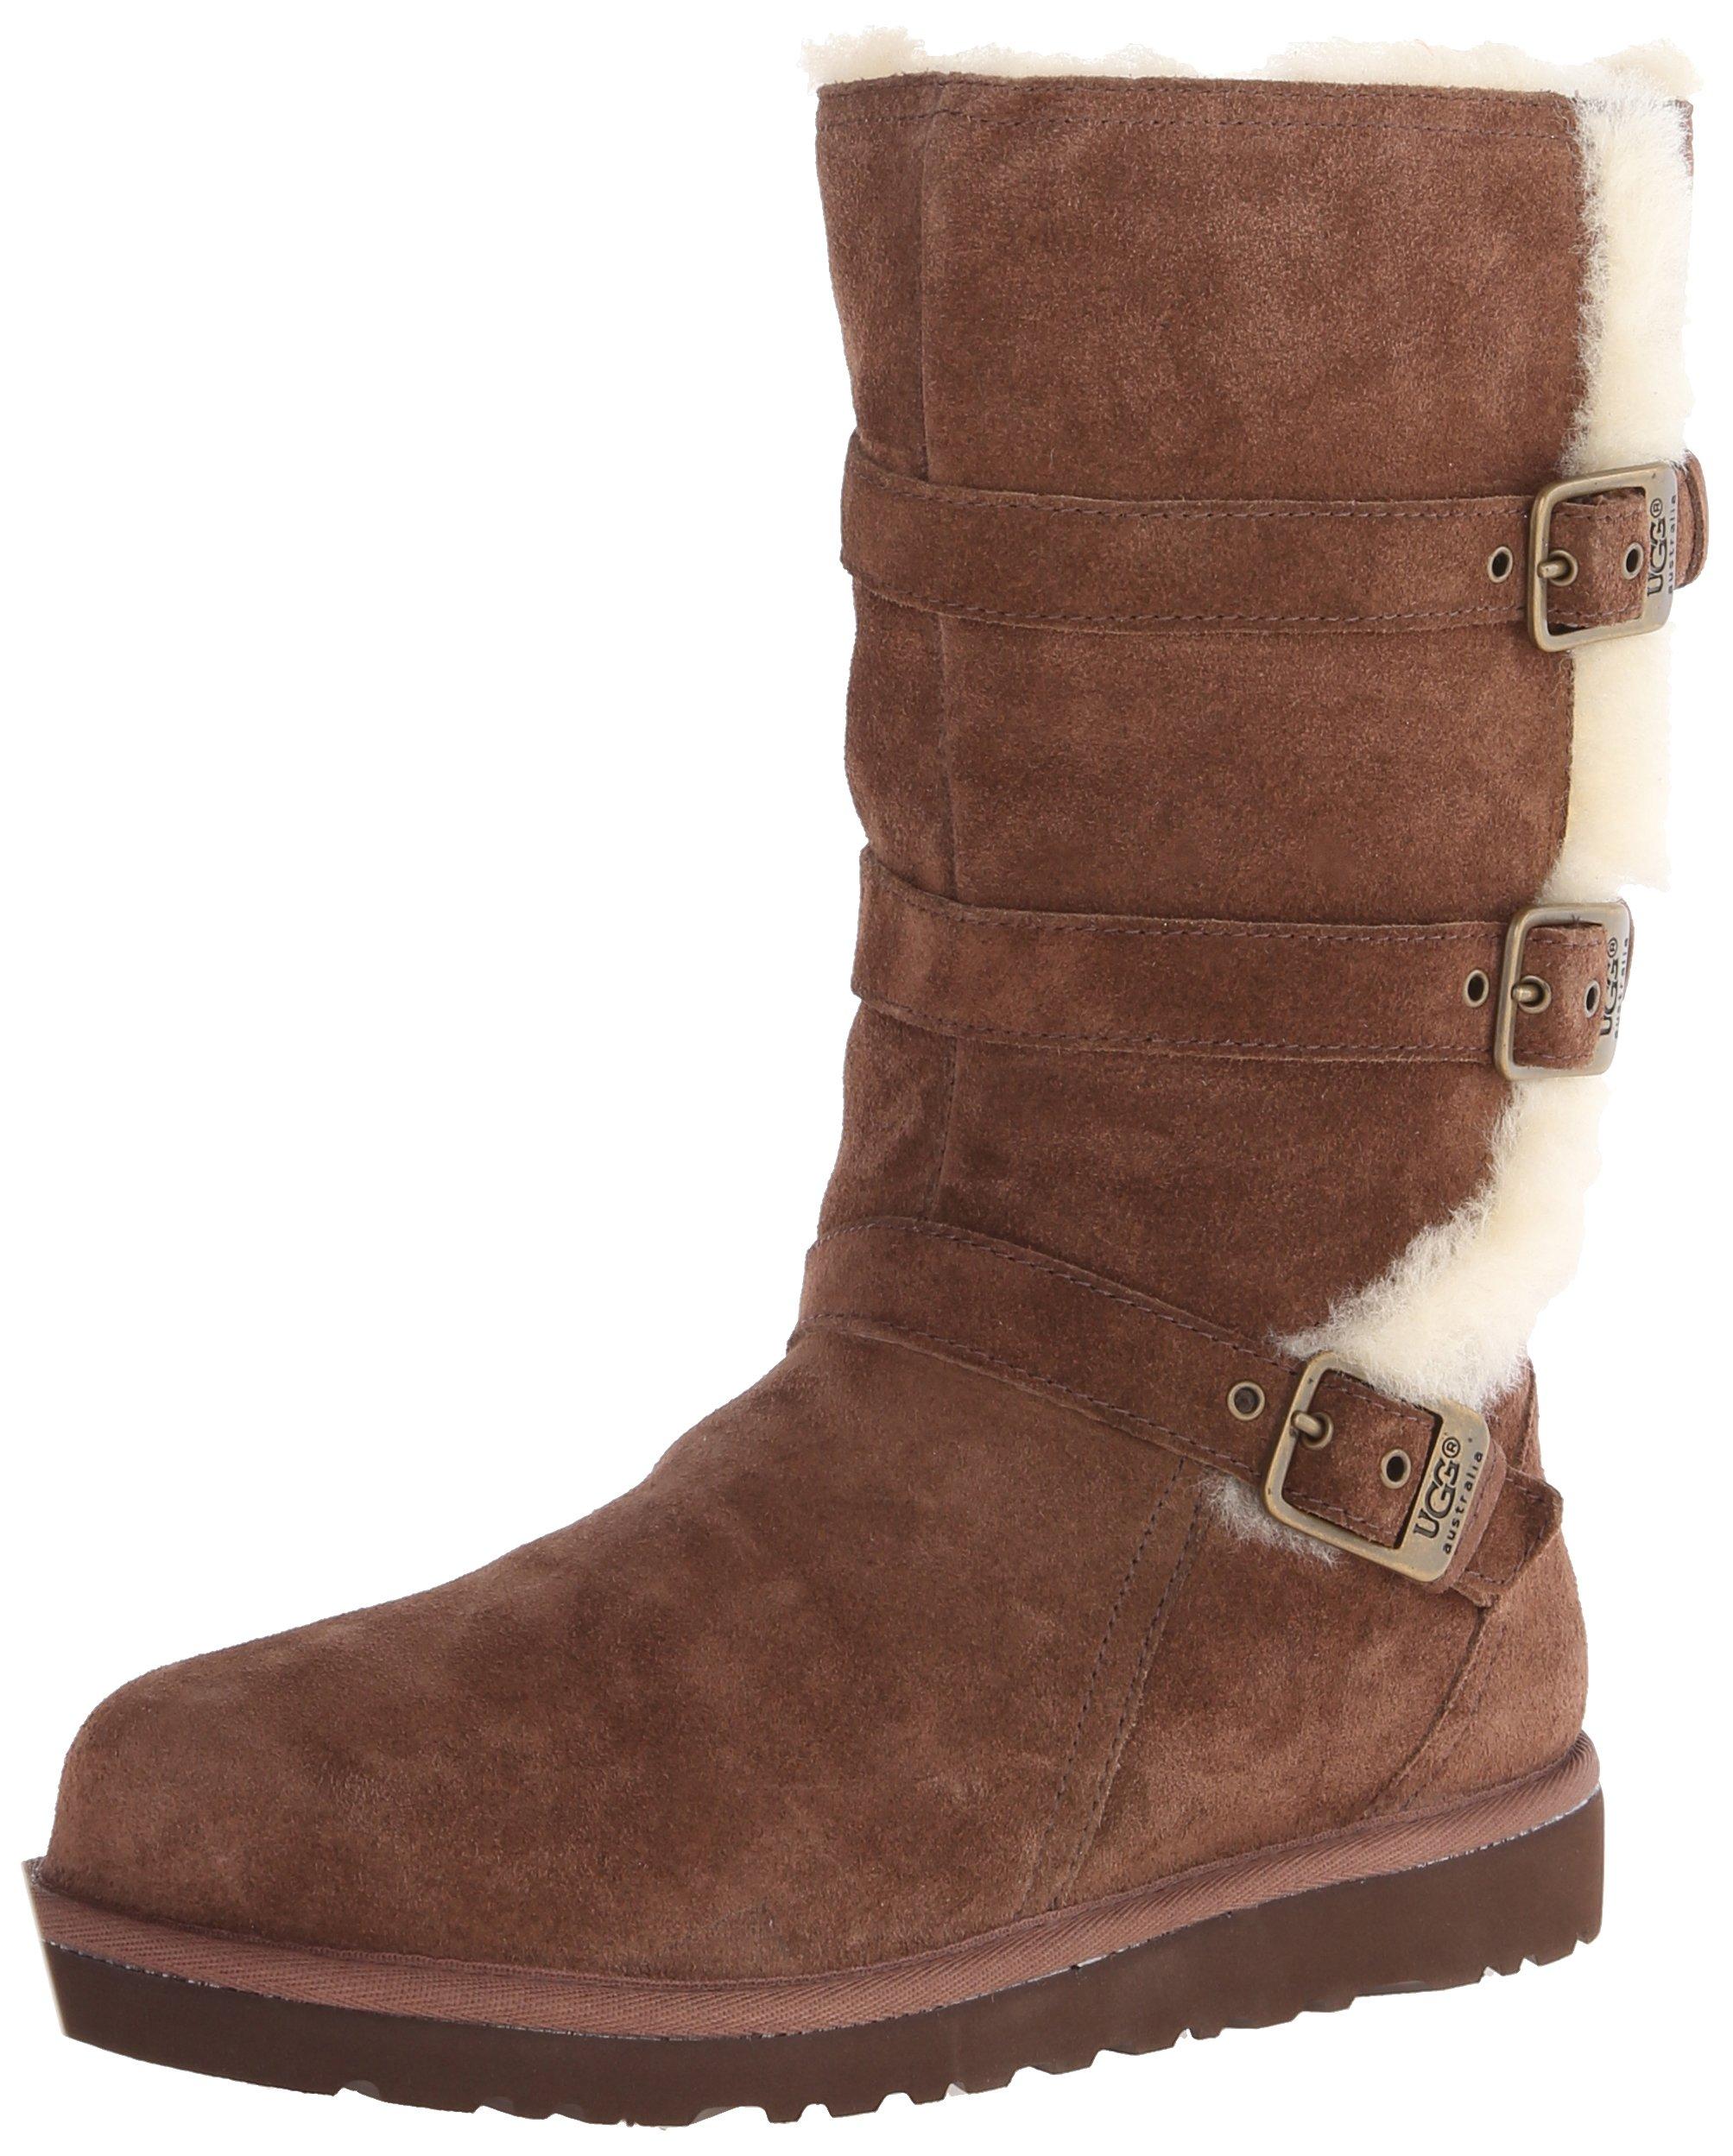 UGG Australia Girls Maddi Chocolate Western Boot - 5 by UGG (Image #6)